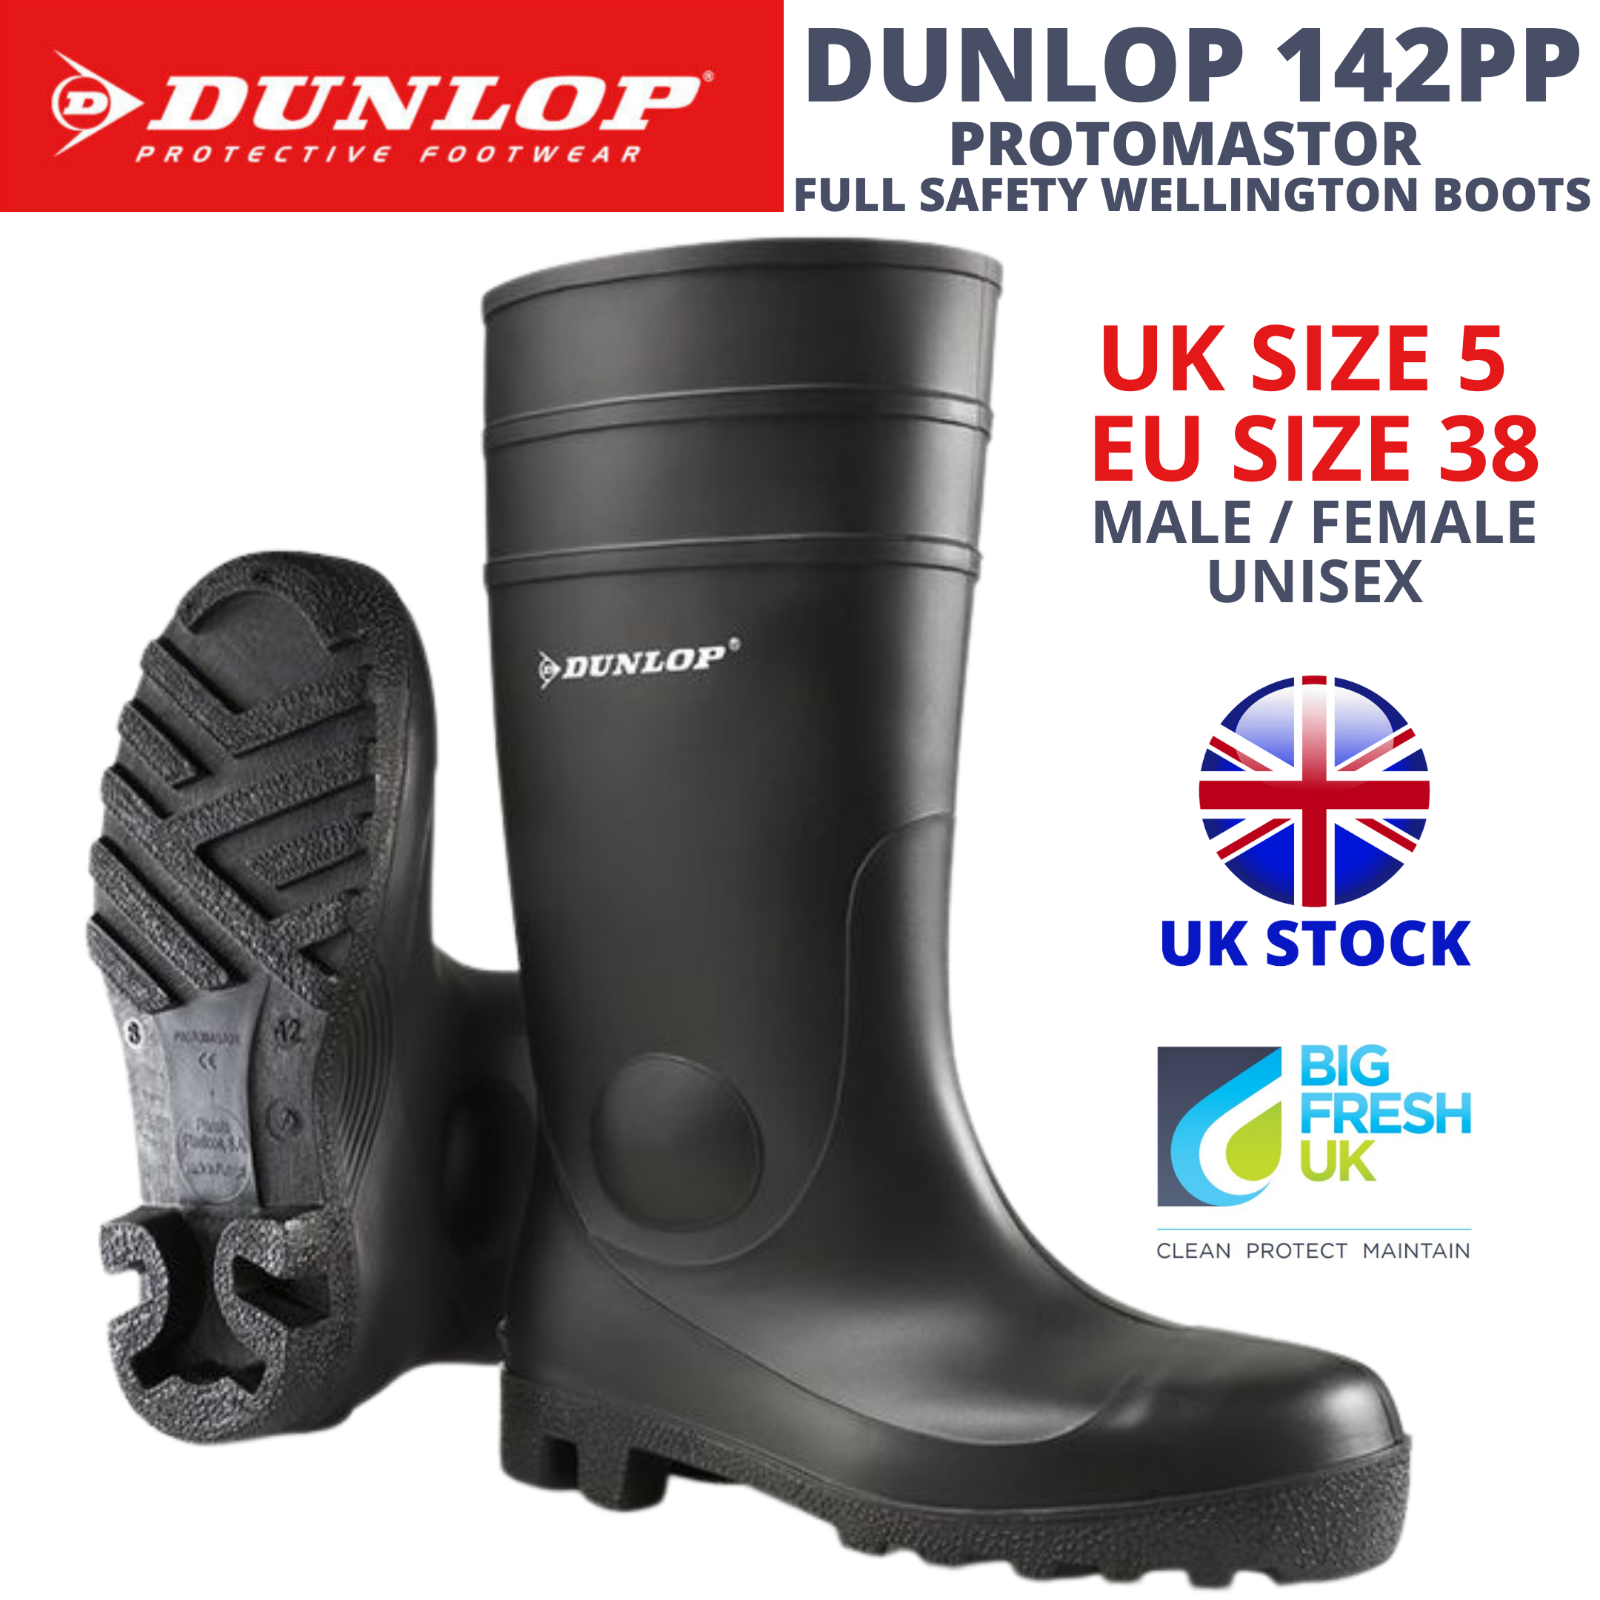 DUNLOP WELLINGTON BOOTS 142PP PROTOMASTOR SAFETY WELLIES STEEL TOE - UK 5 EU 38